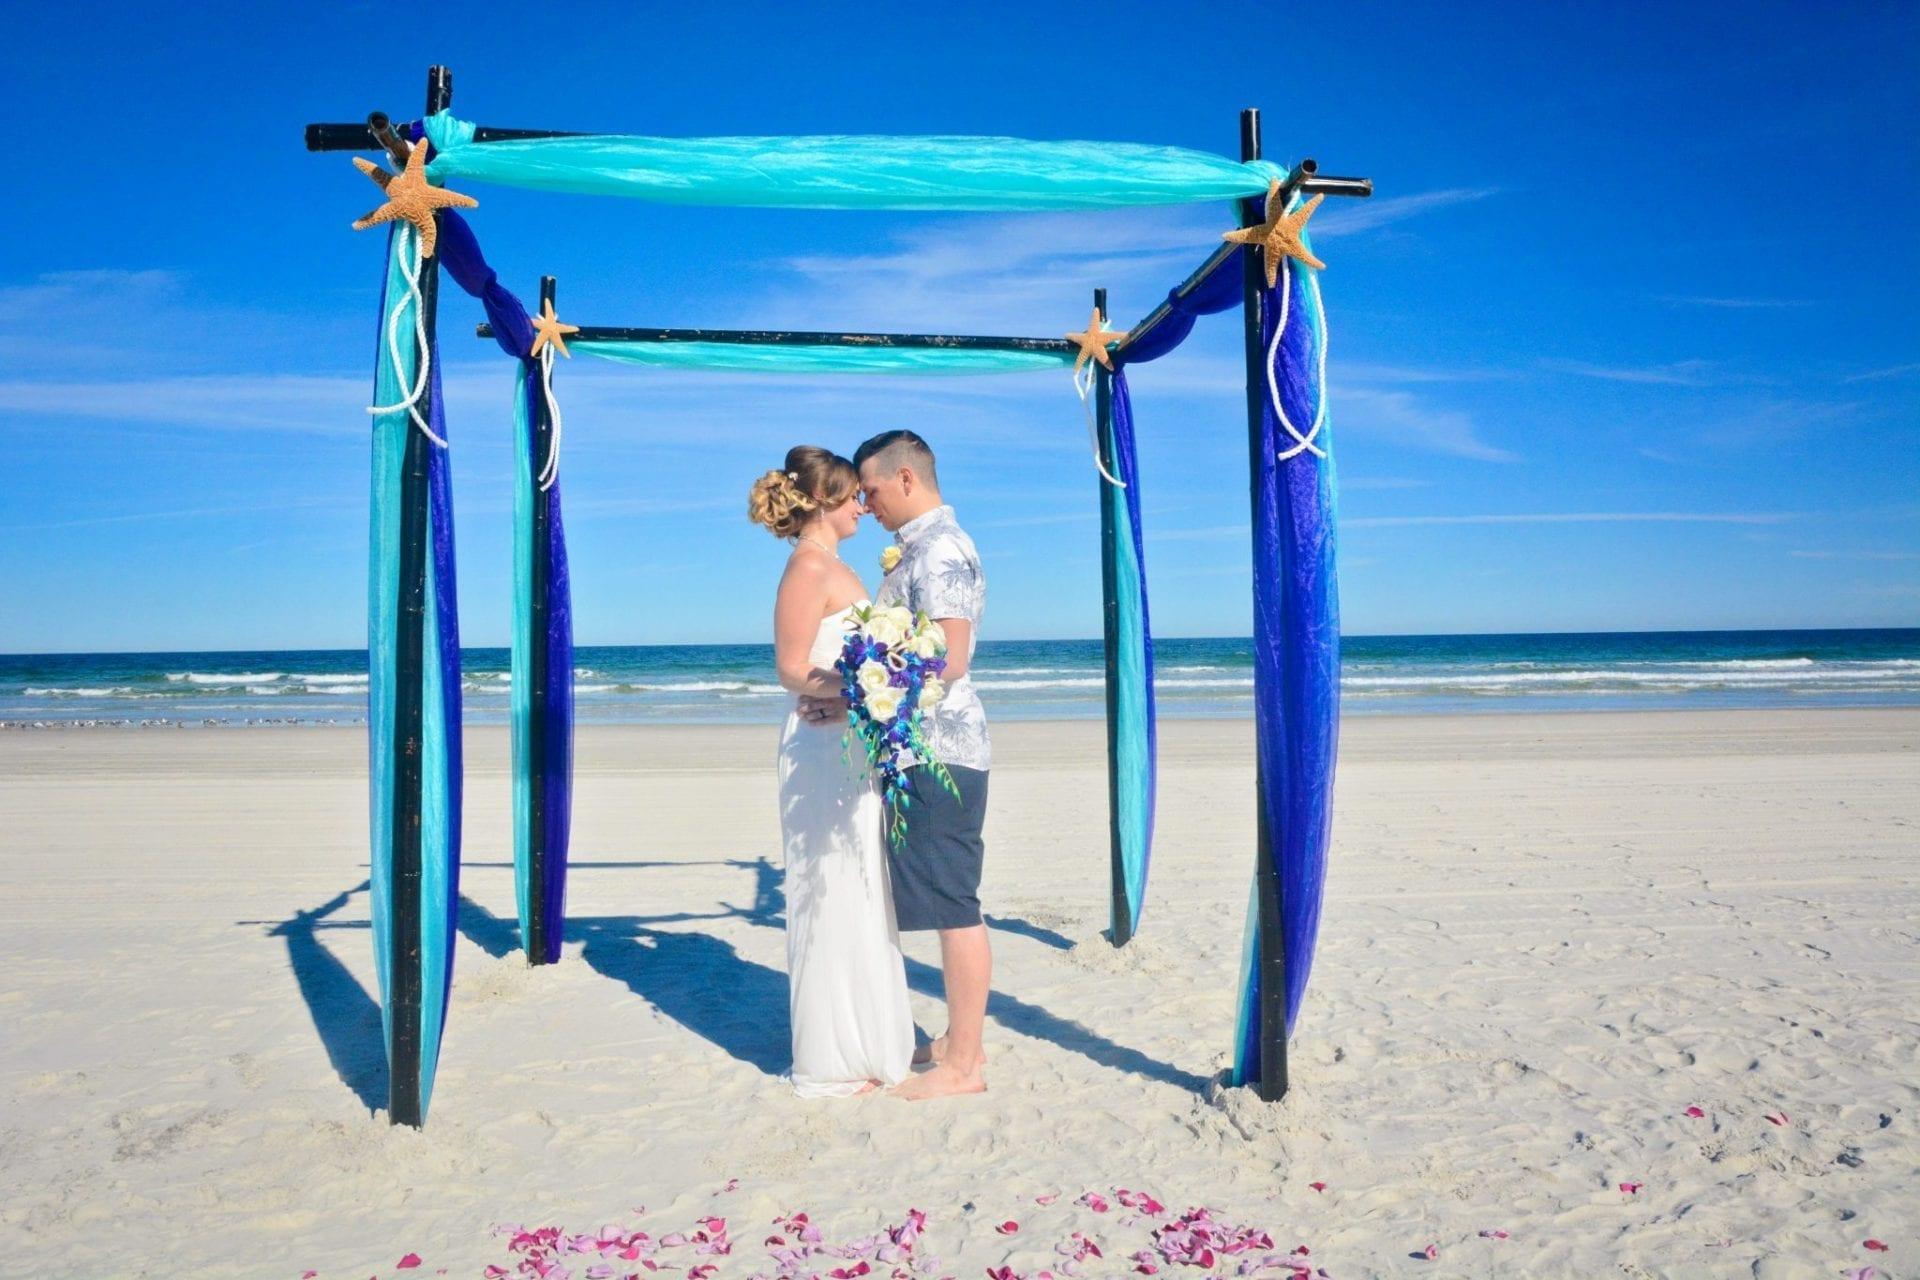 Beach Wedding Planning Archives   Page 18 of 18   Florida Beach Weddings